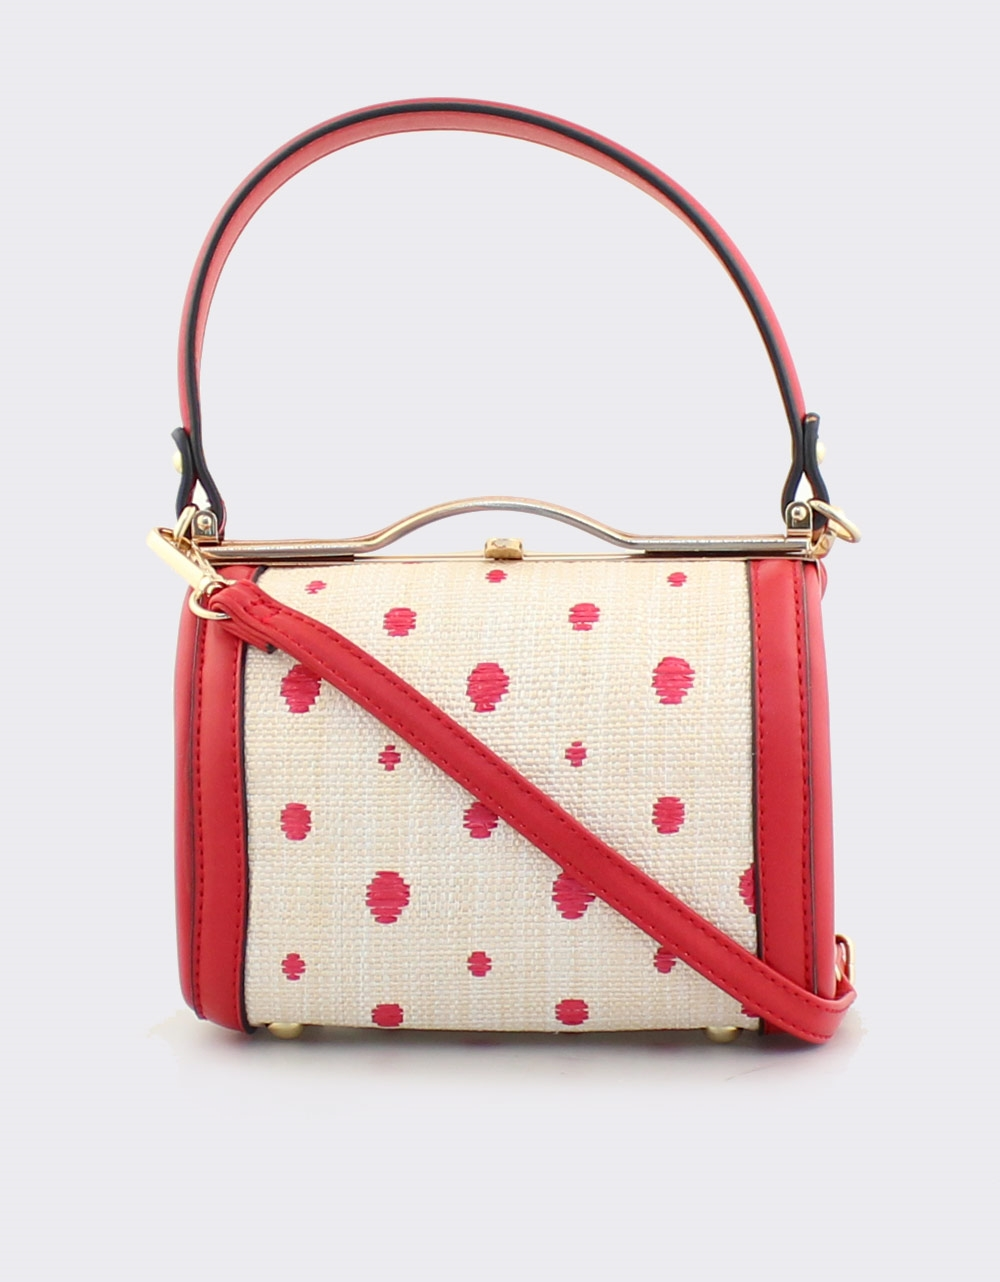 cd72e09858 Εικόνα από Γυναικείες τσάντες χειρός με πουά μοτίβο Κόκκινο